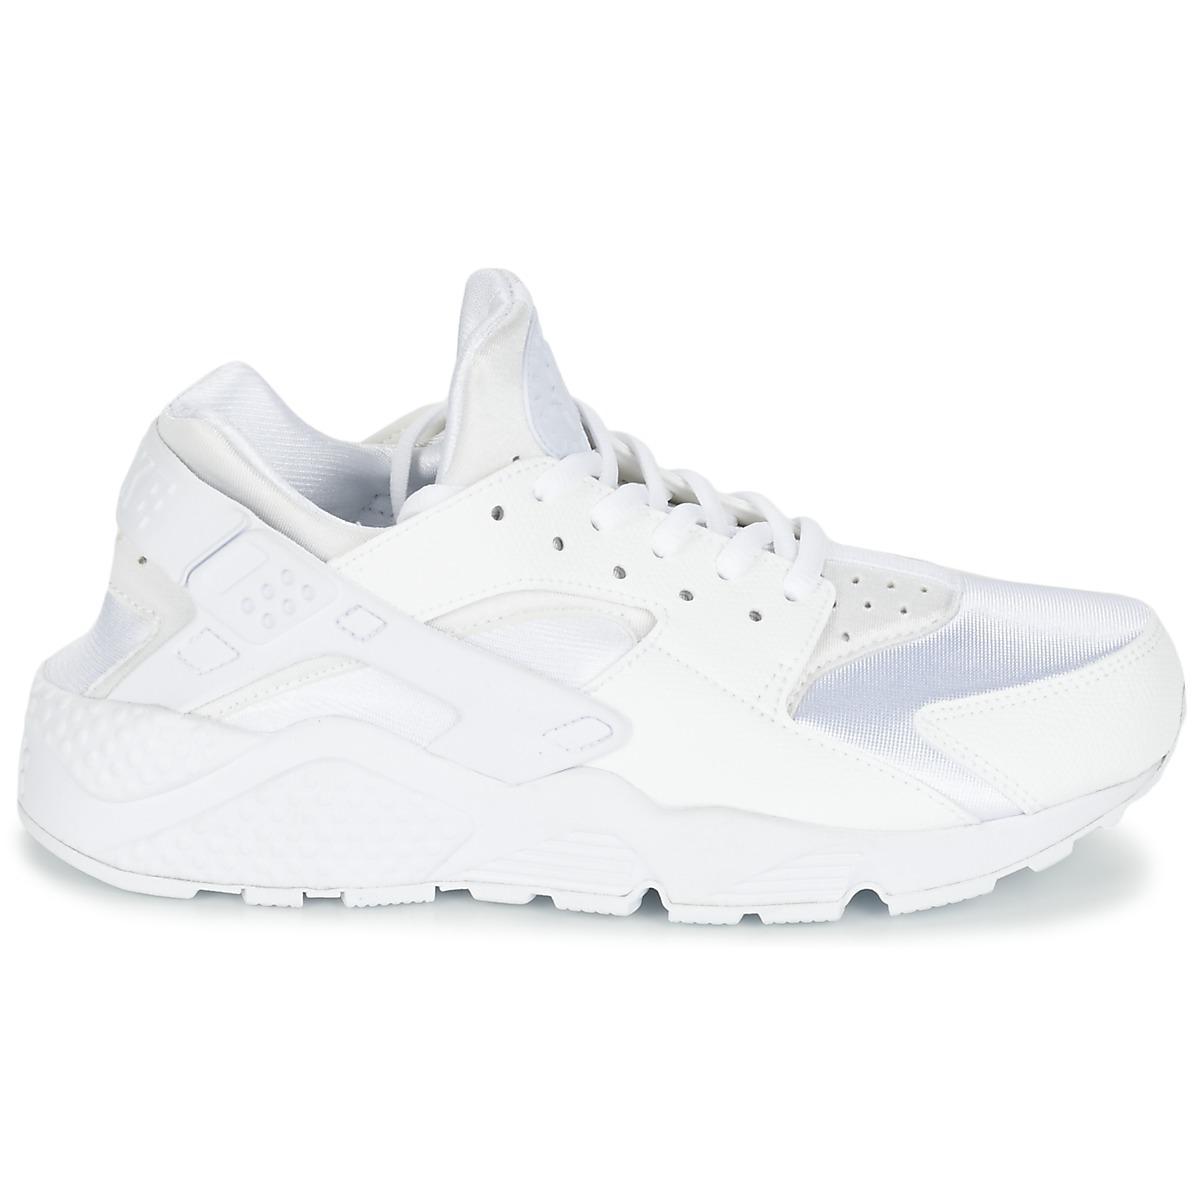 ca89672fa0f7 Nike - White Air Huarache Run W Shoes (trainers) - Lyst. View fullscreen